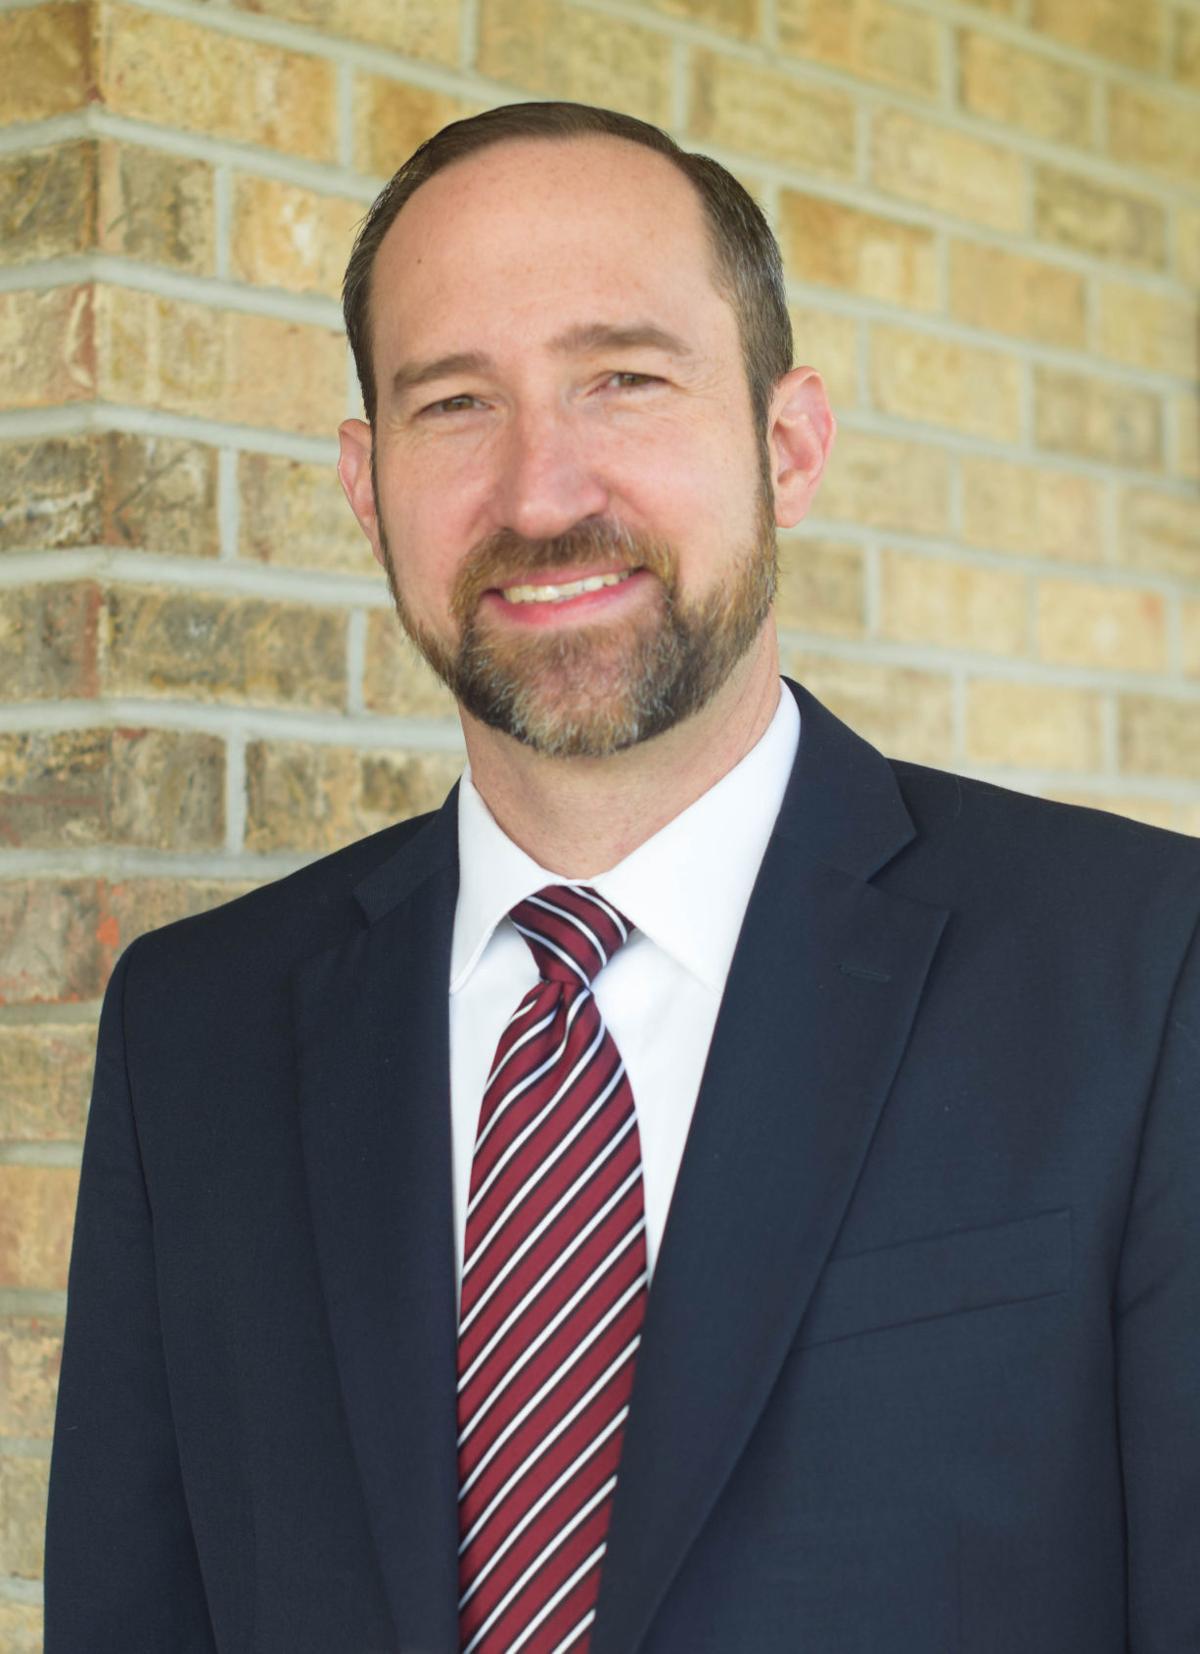 Assistant U.S. Attorney Andrew Cogar